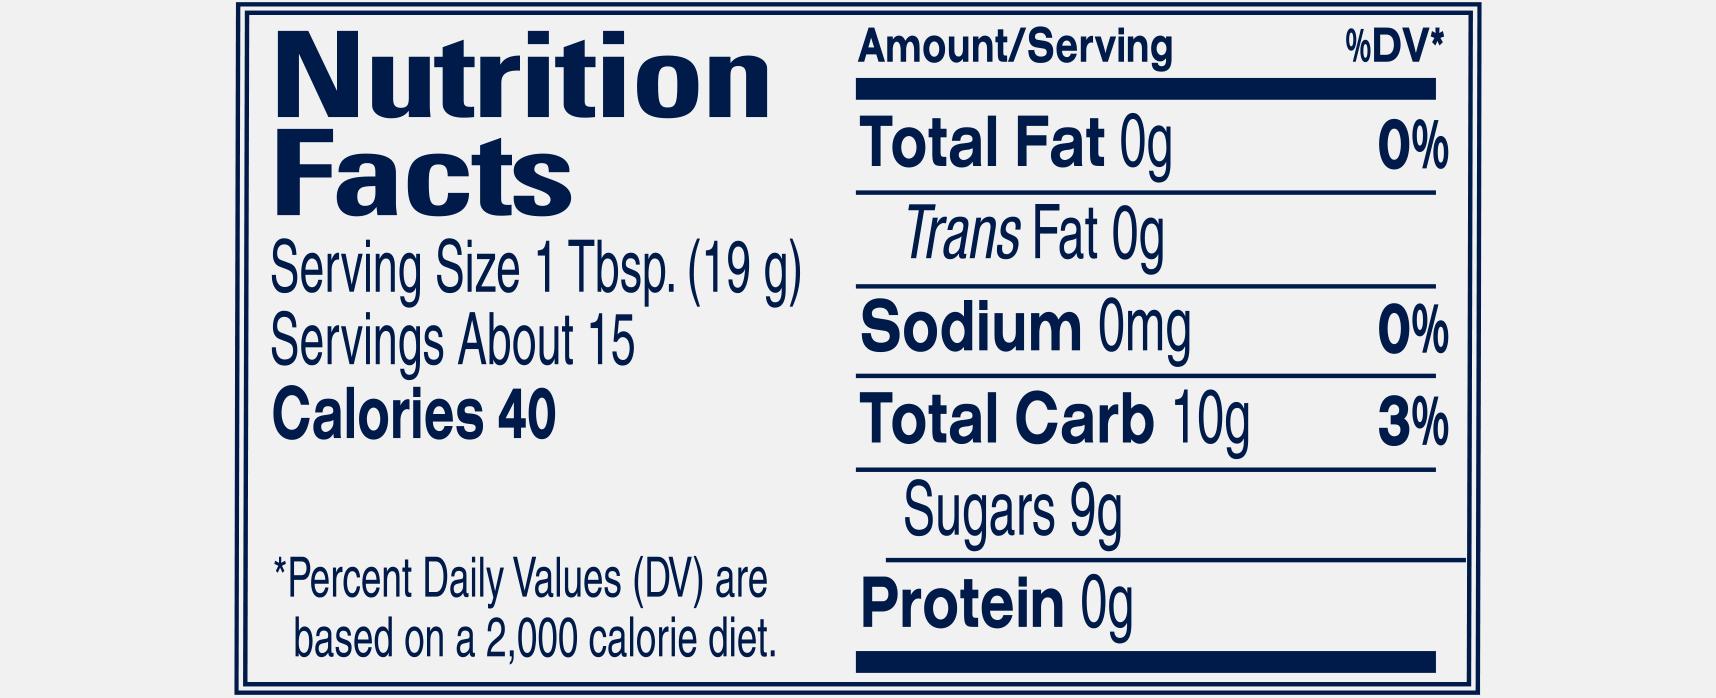 StDalfour_NutritionFacts_Blackcurrant.png